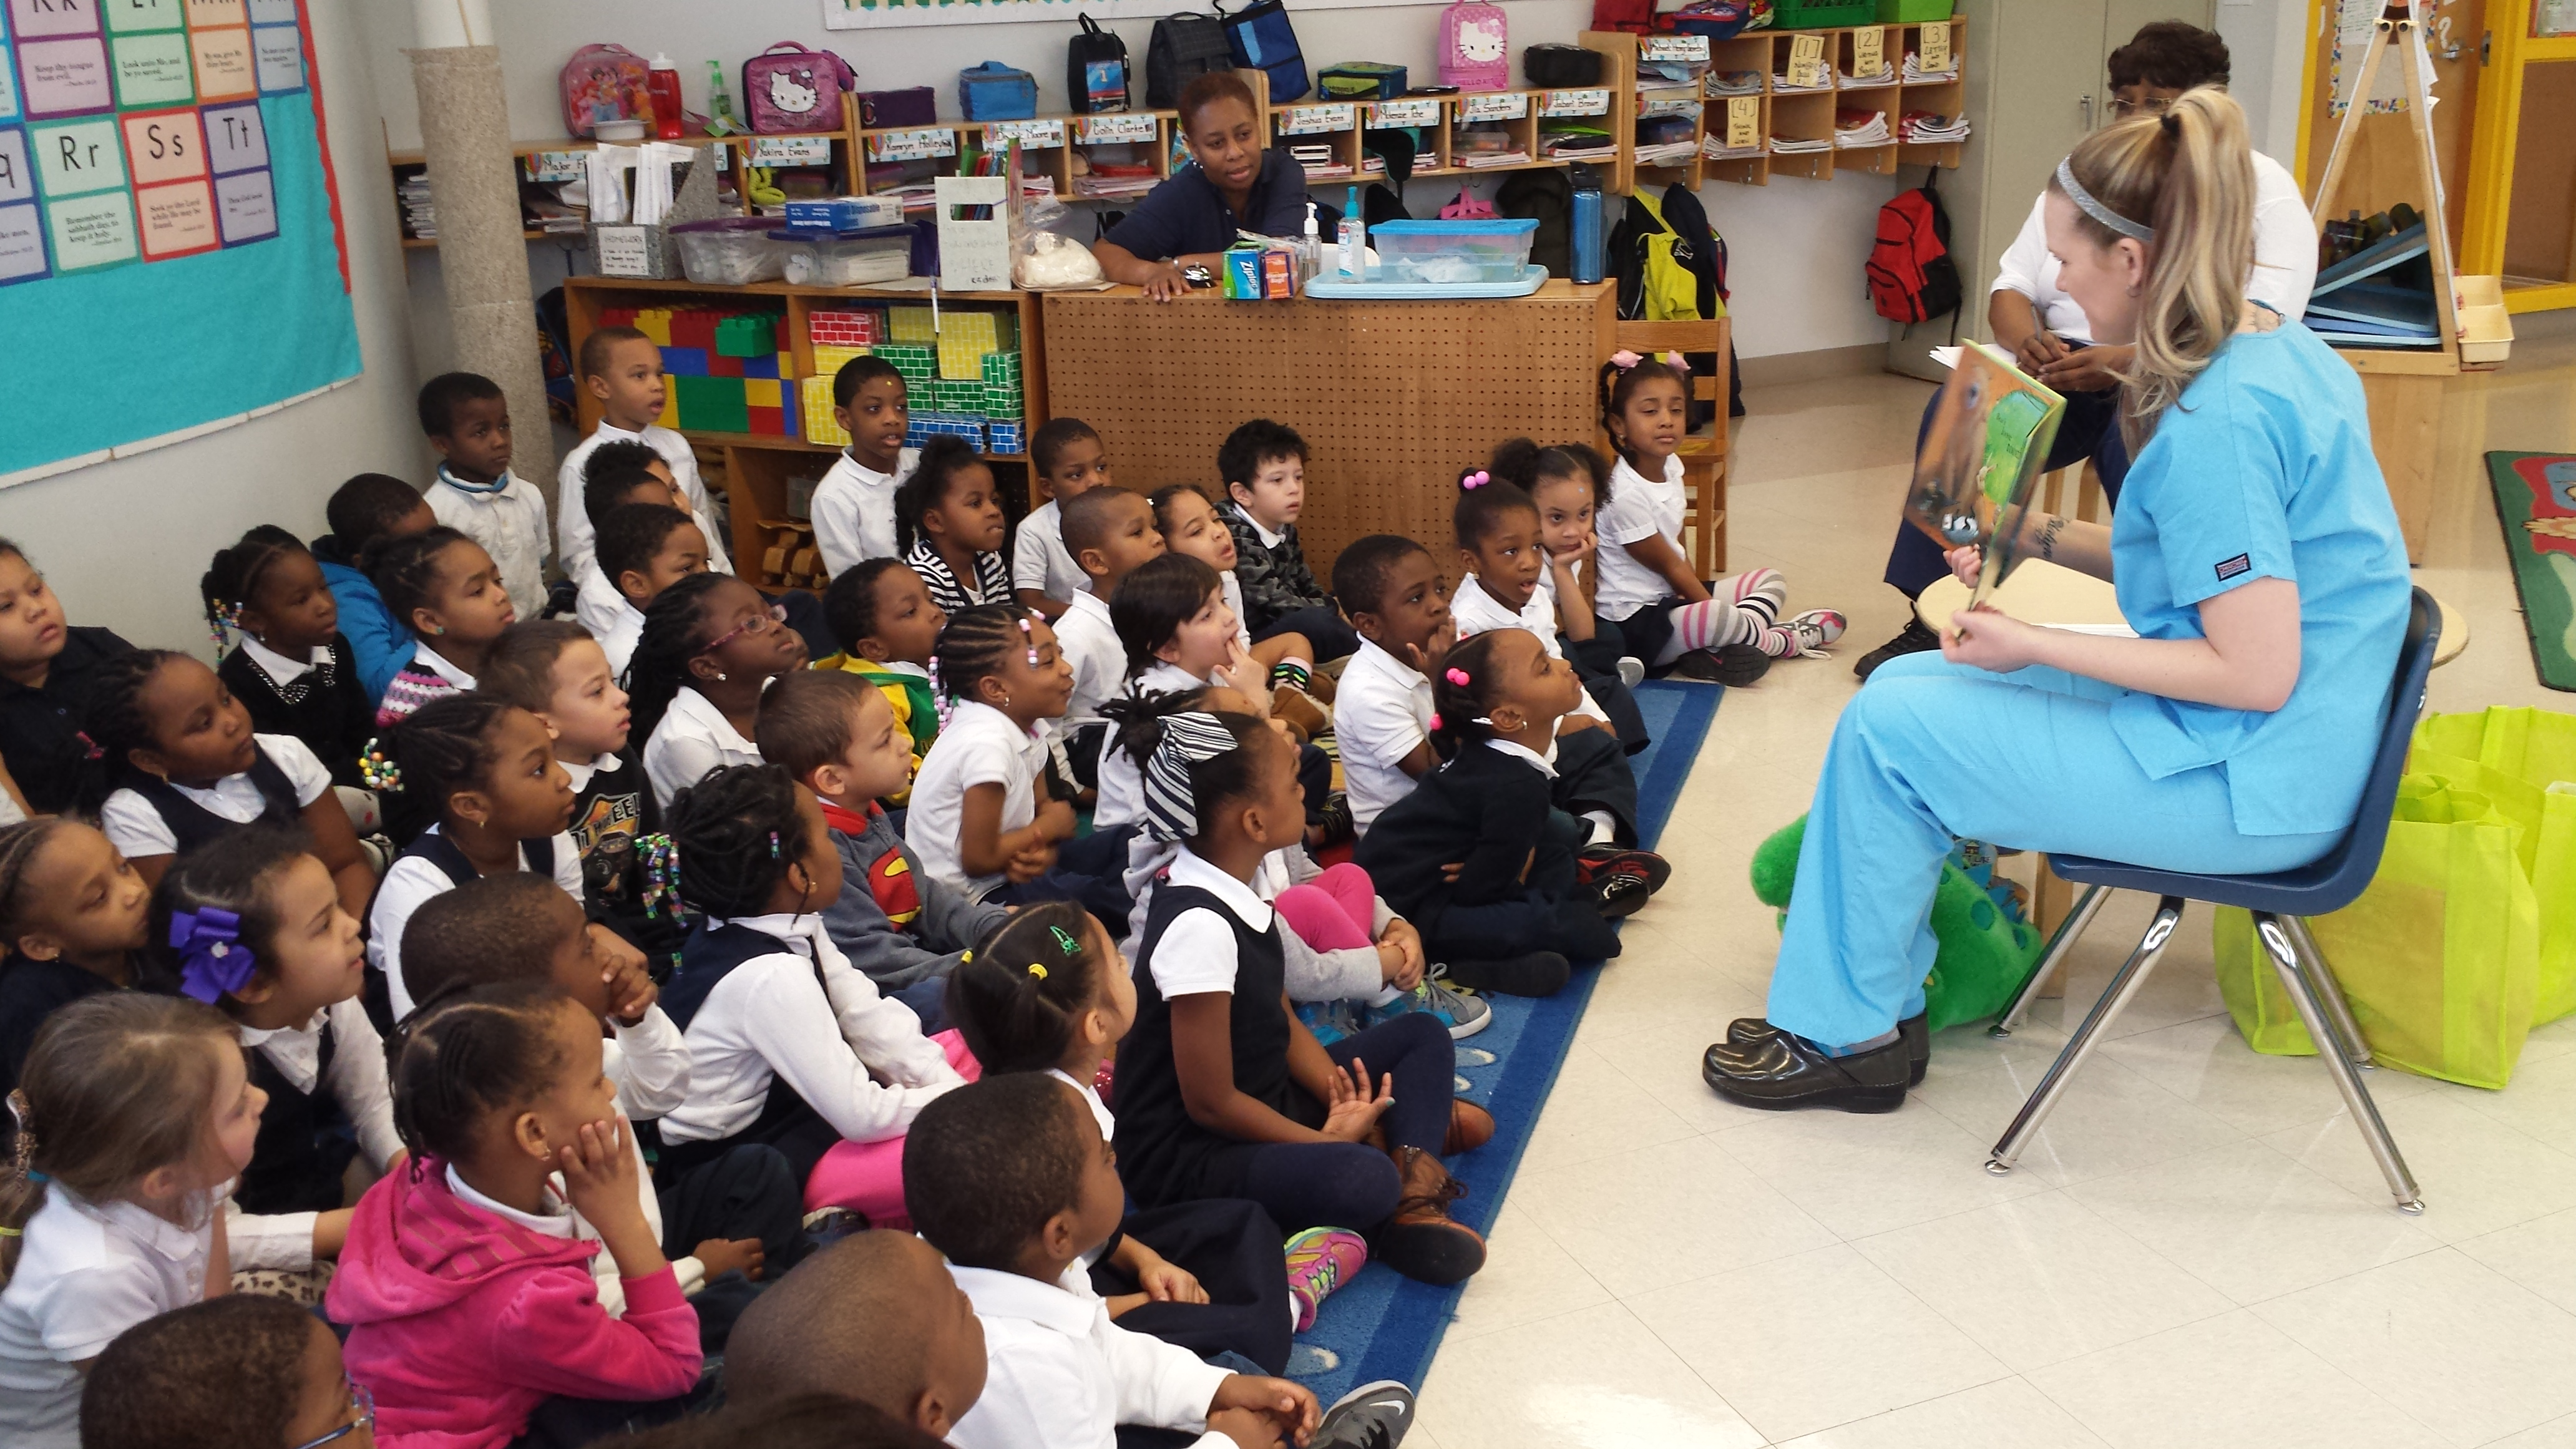 Laurel MD, Childcare, daycare